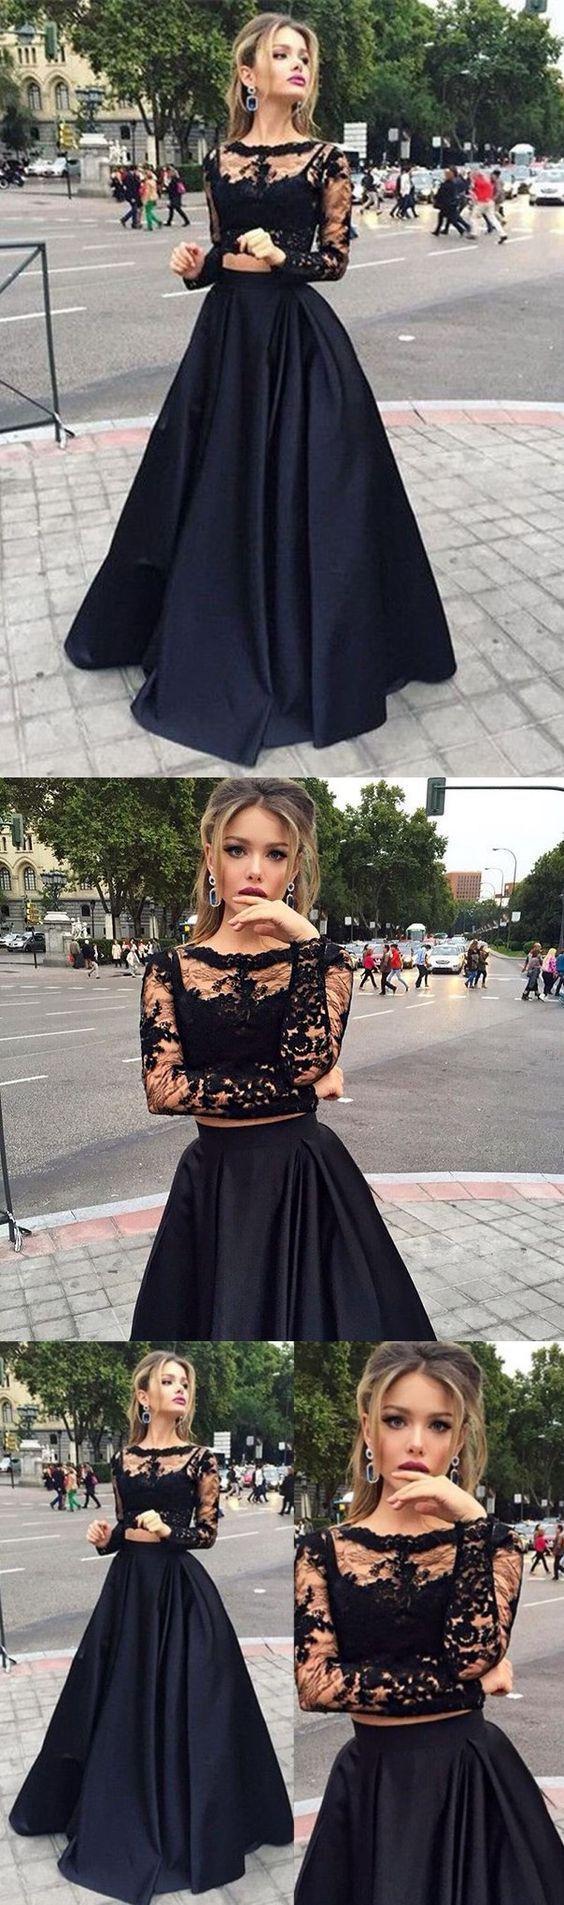 Black Prom Dress,Lace prom dress,2017 Prom dress,Long Sleeves prom dress,: #partydresses